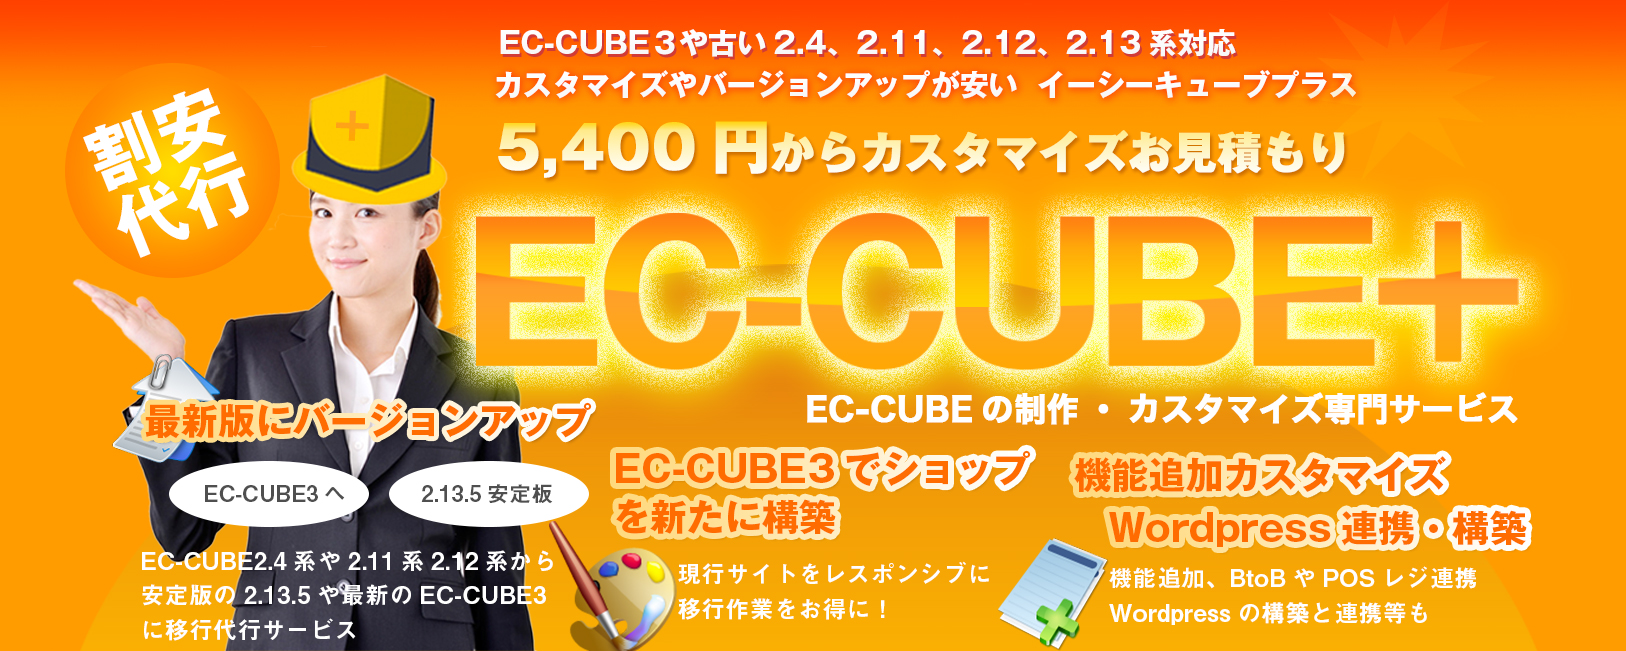 EC-CUBE+(プラス)